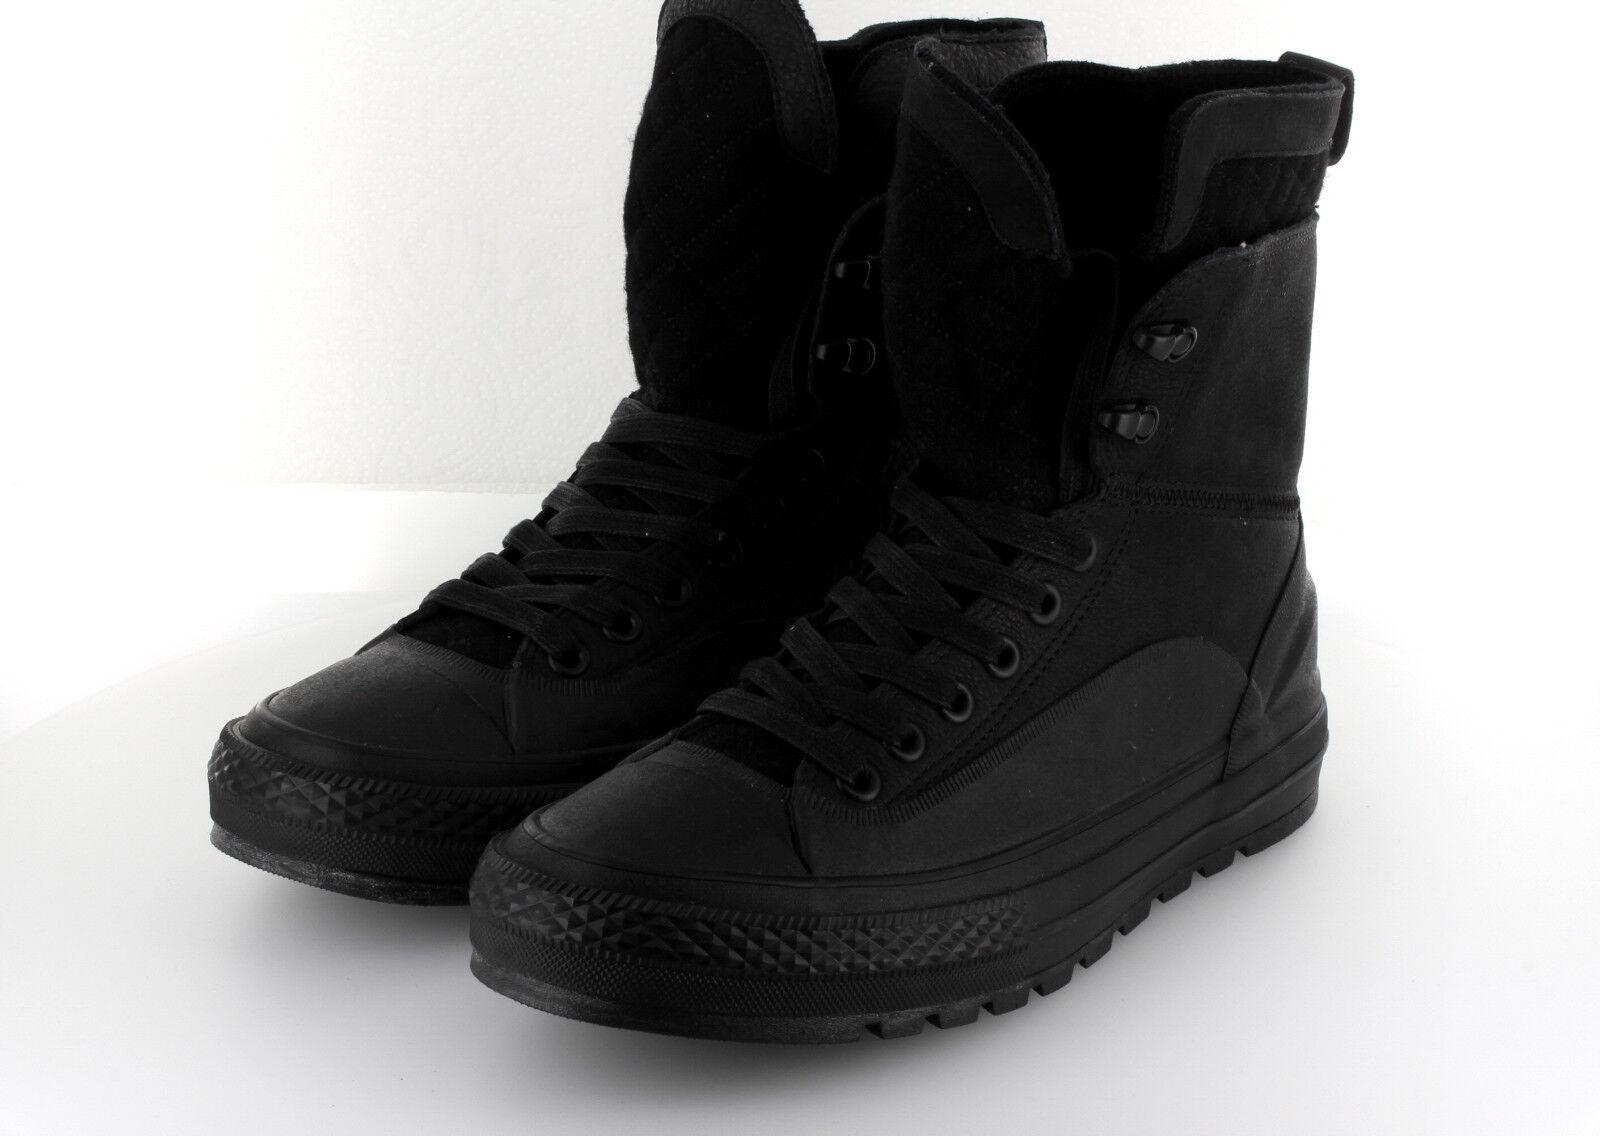 Converse Chuck Taylor AS Hi Street Hiker Boot Black Leder Fulton 42,5   43 US9